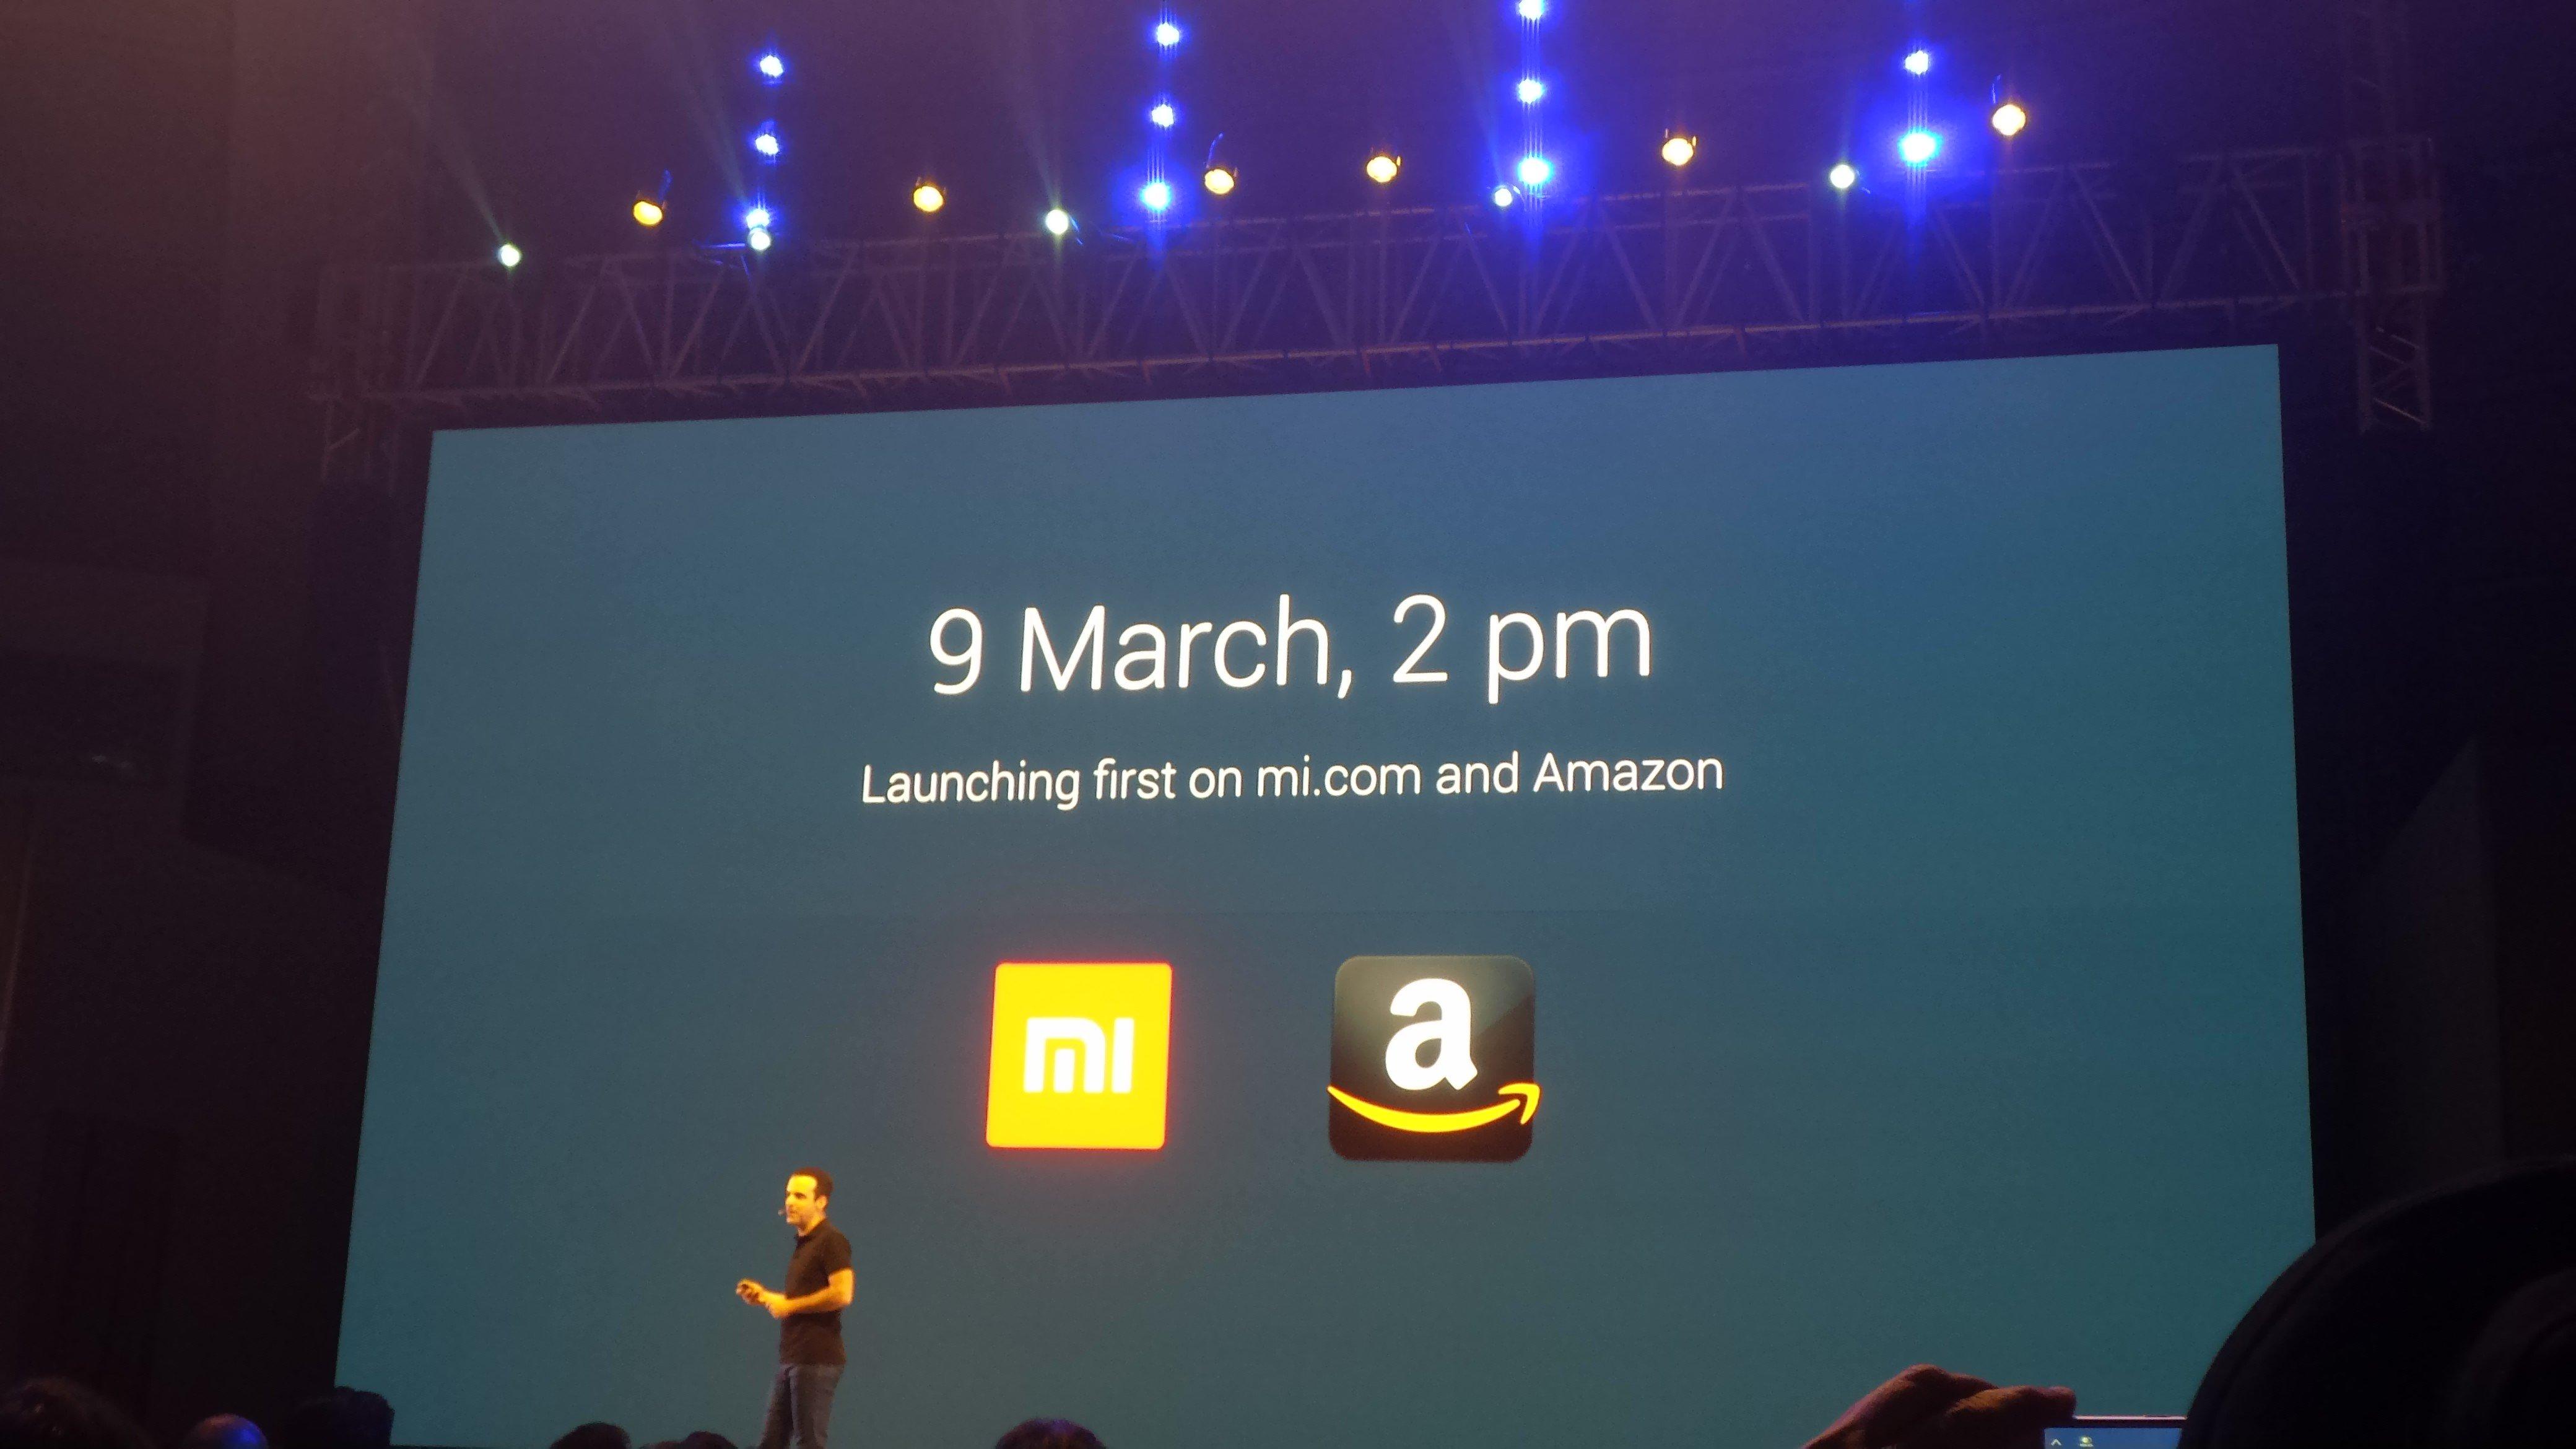 xioami-redmi-note-3-india-review-pc-tablet-india